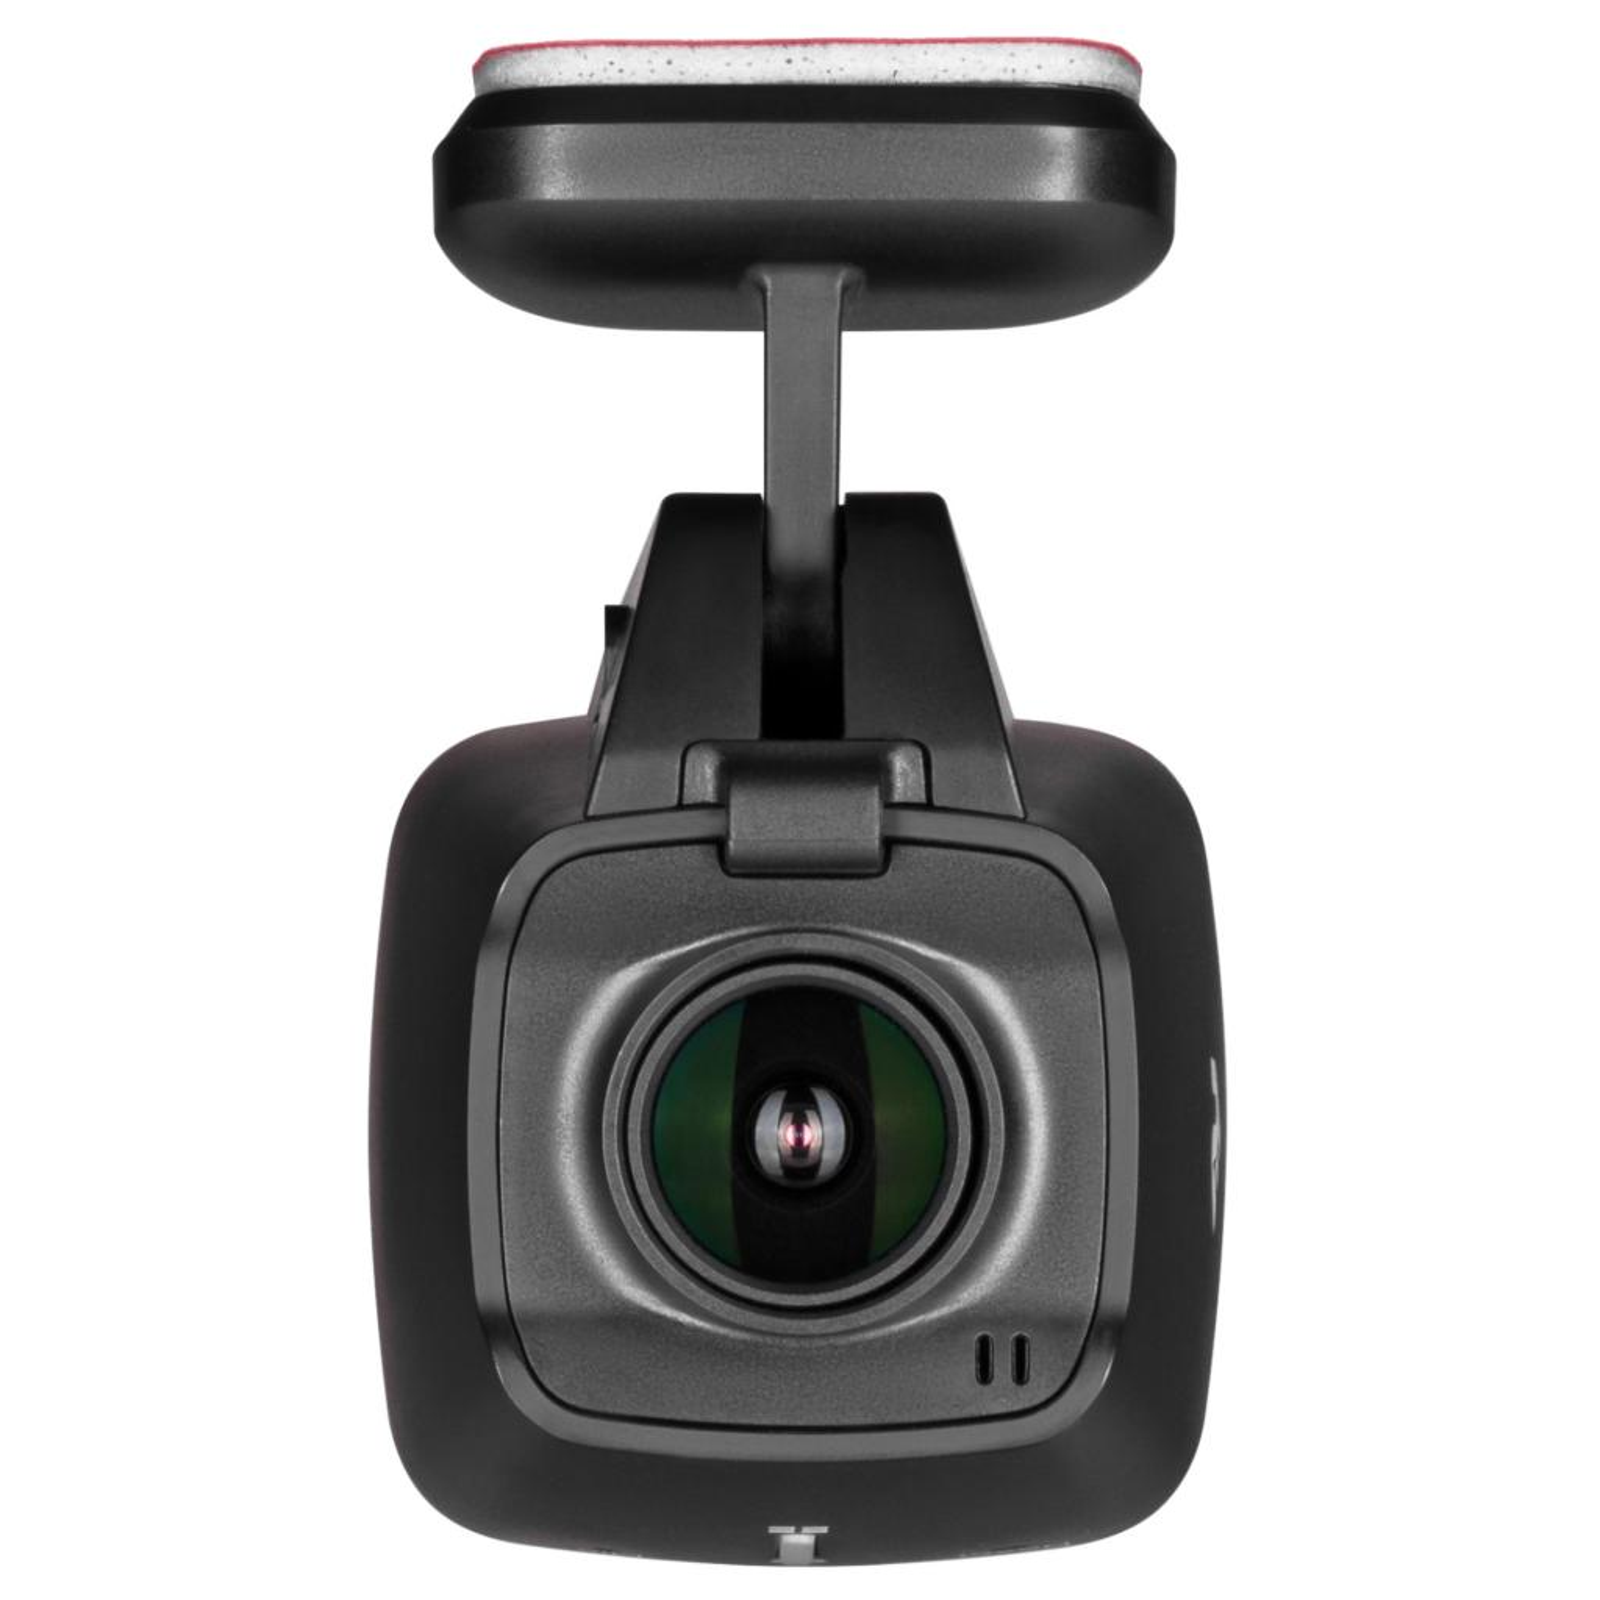 Відеореєстратор 2E Drive 550 Magnet (2E-DRIVE550MAGNET) зображення 2